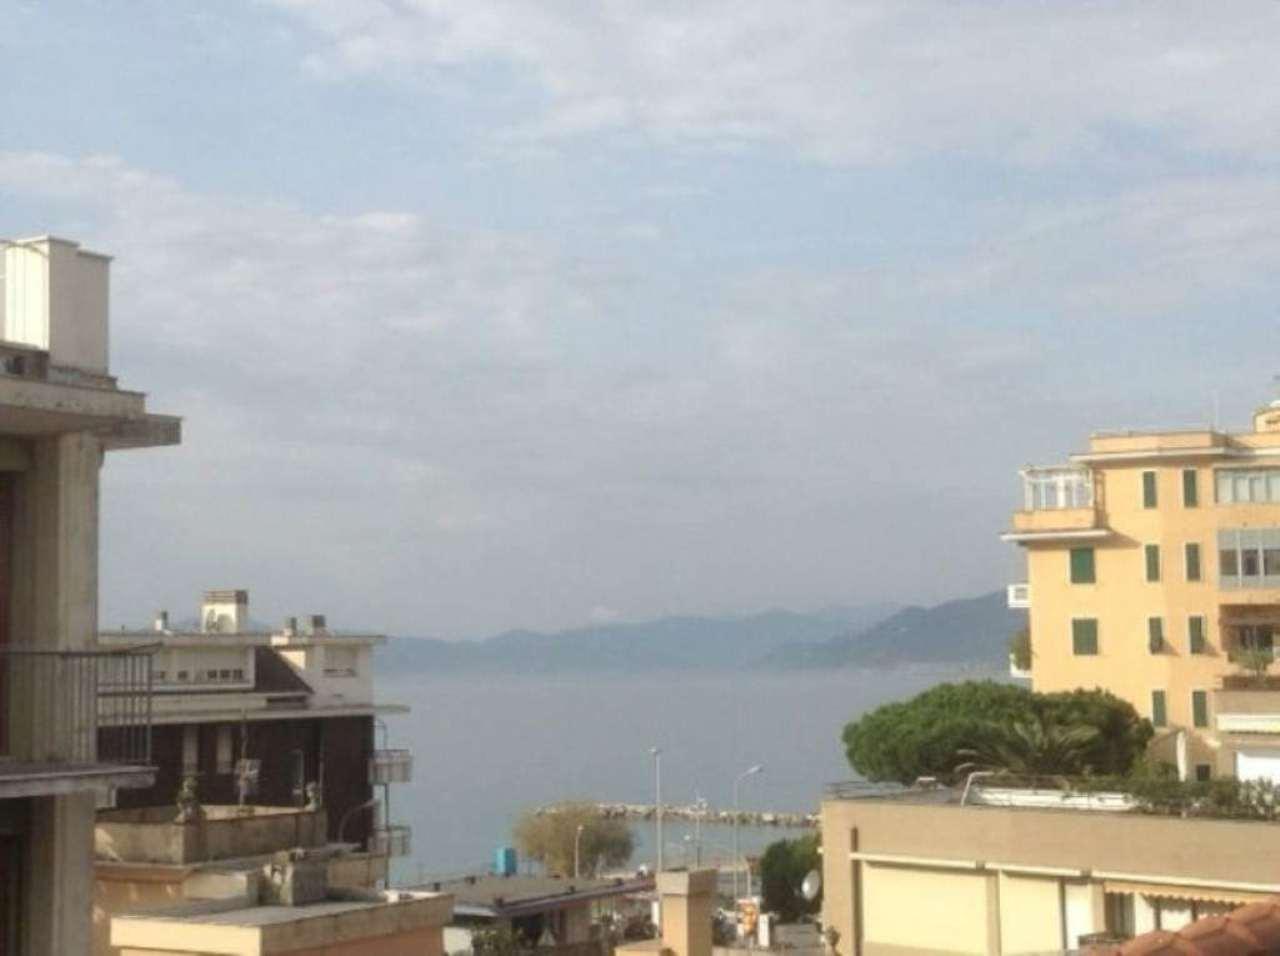 Bilocale Sestri Levante Via Privata Novara 7